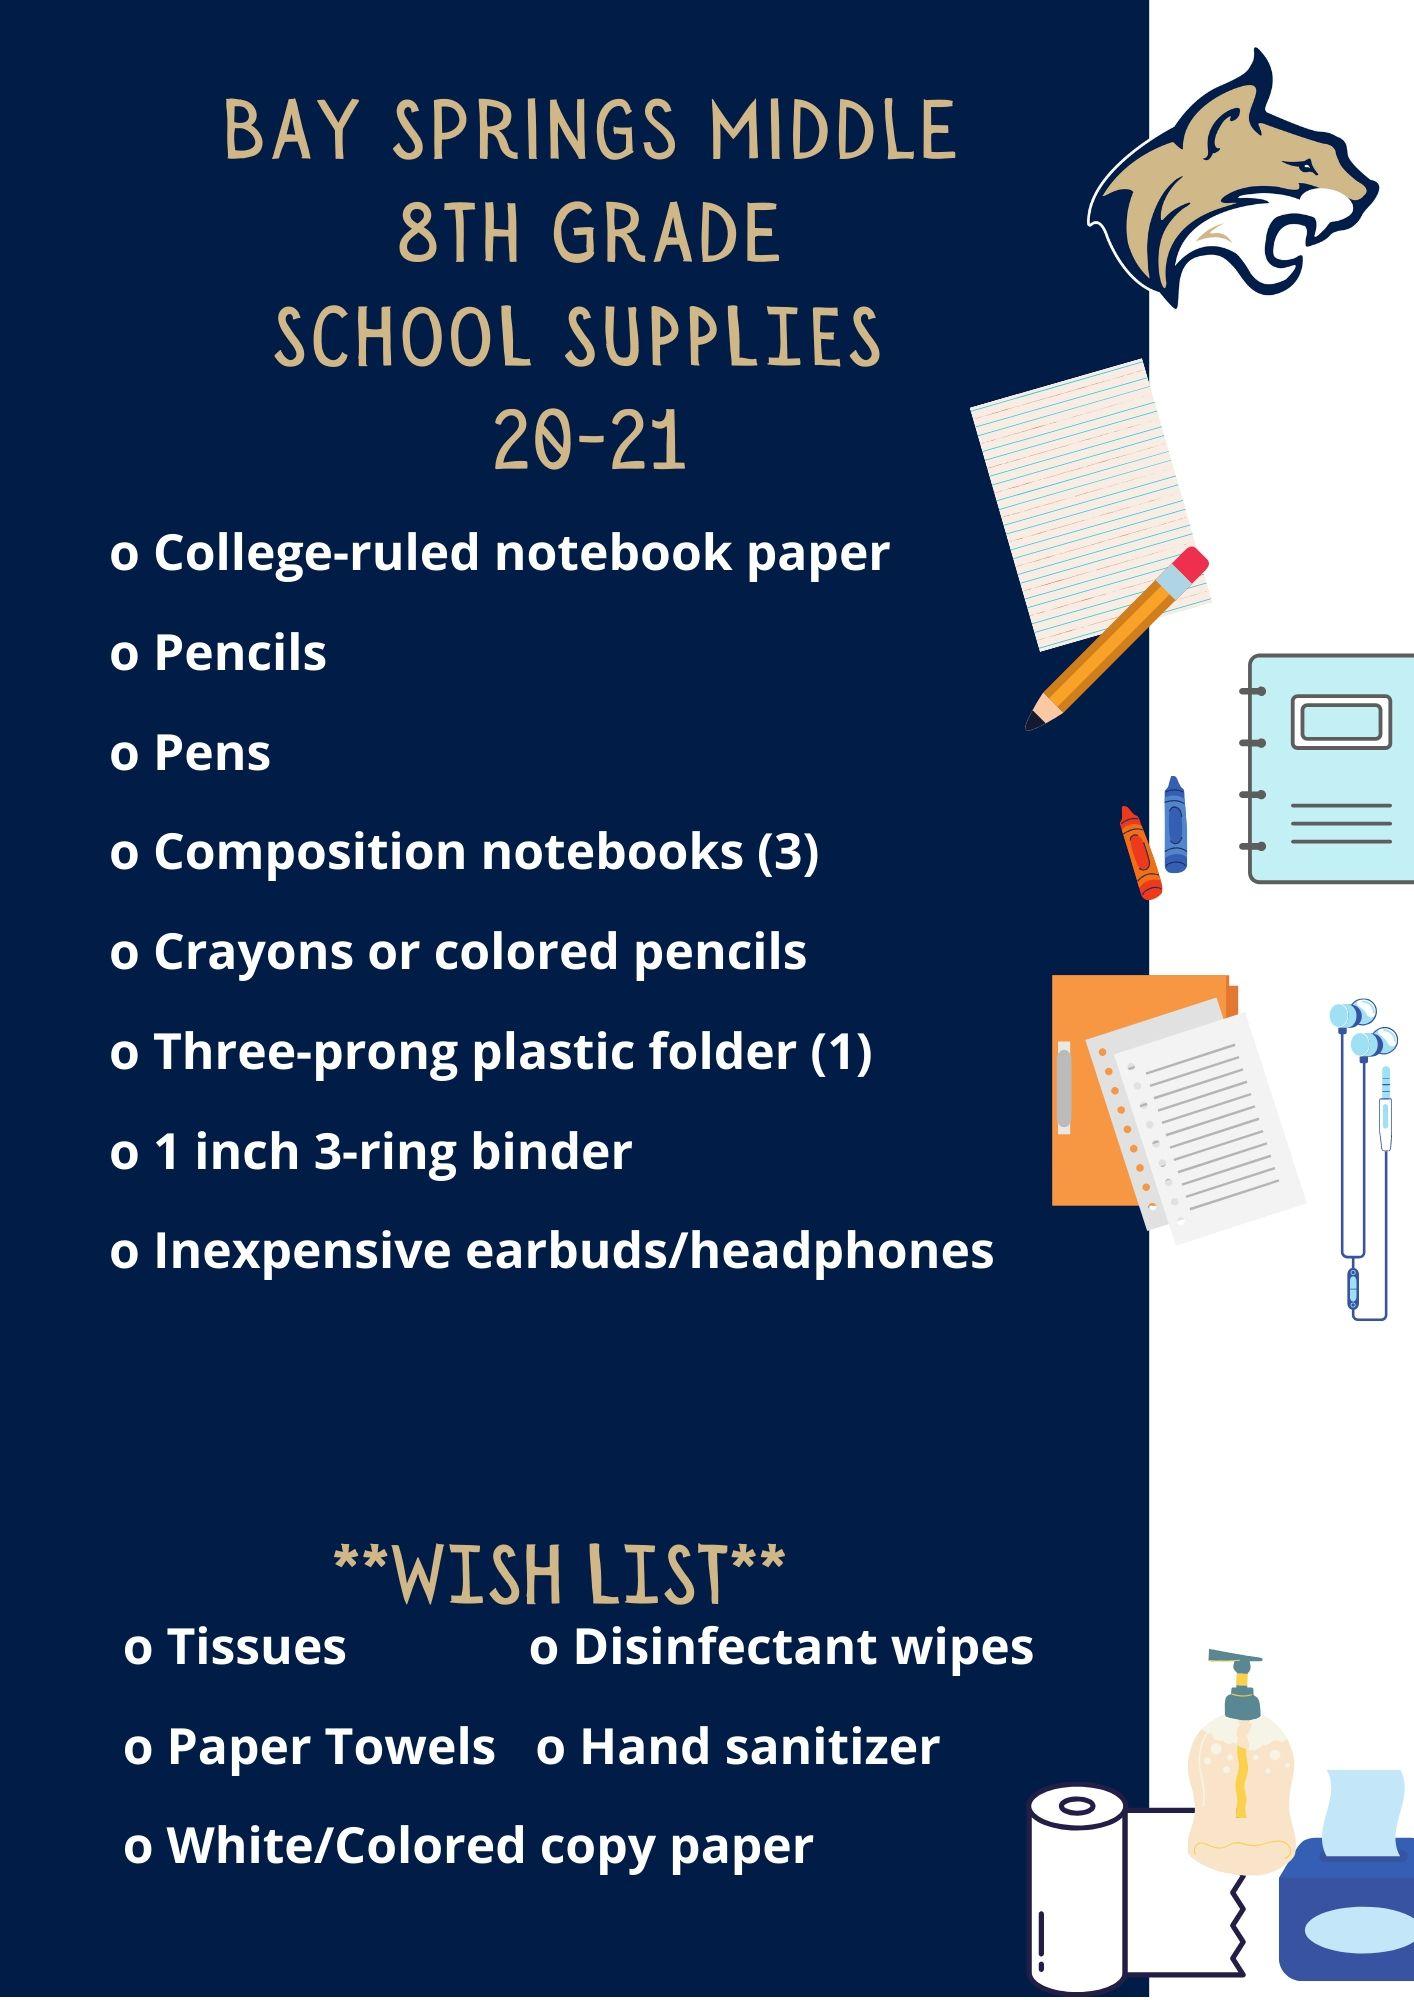 School Supply List ~ 8th Grade